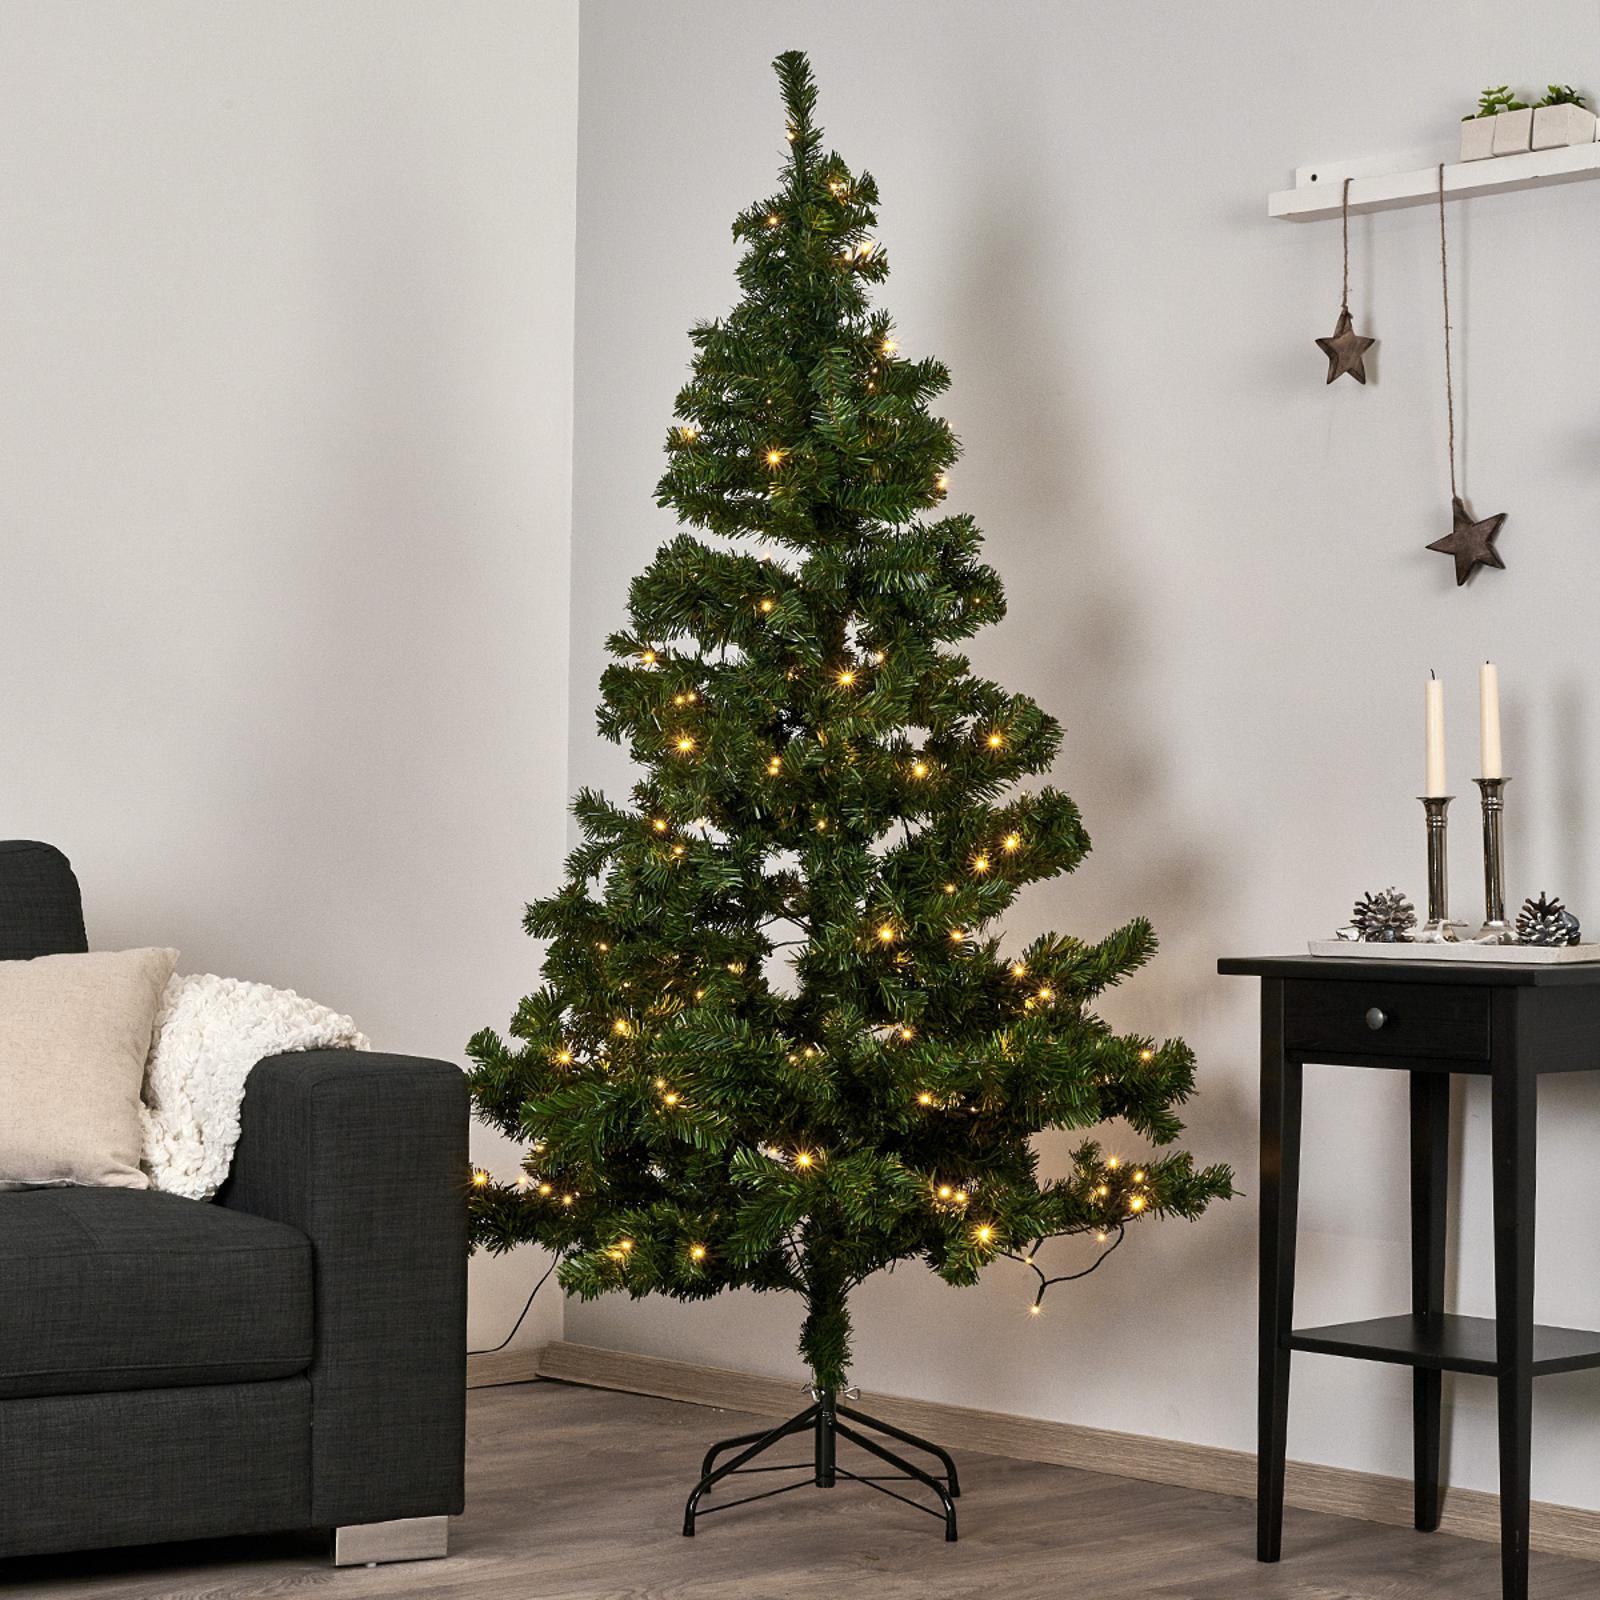 Lysande LED-julgran Ottawa utomhusbruk 1,5m 110LED